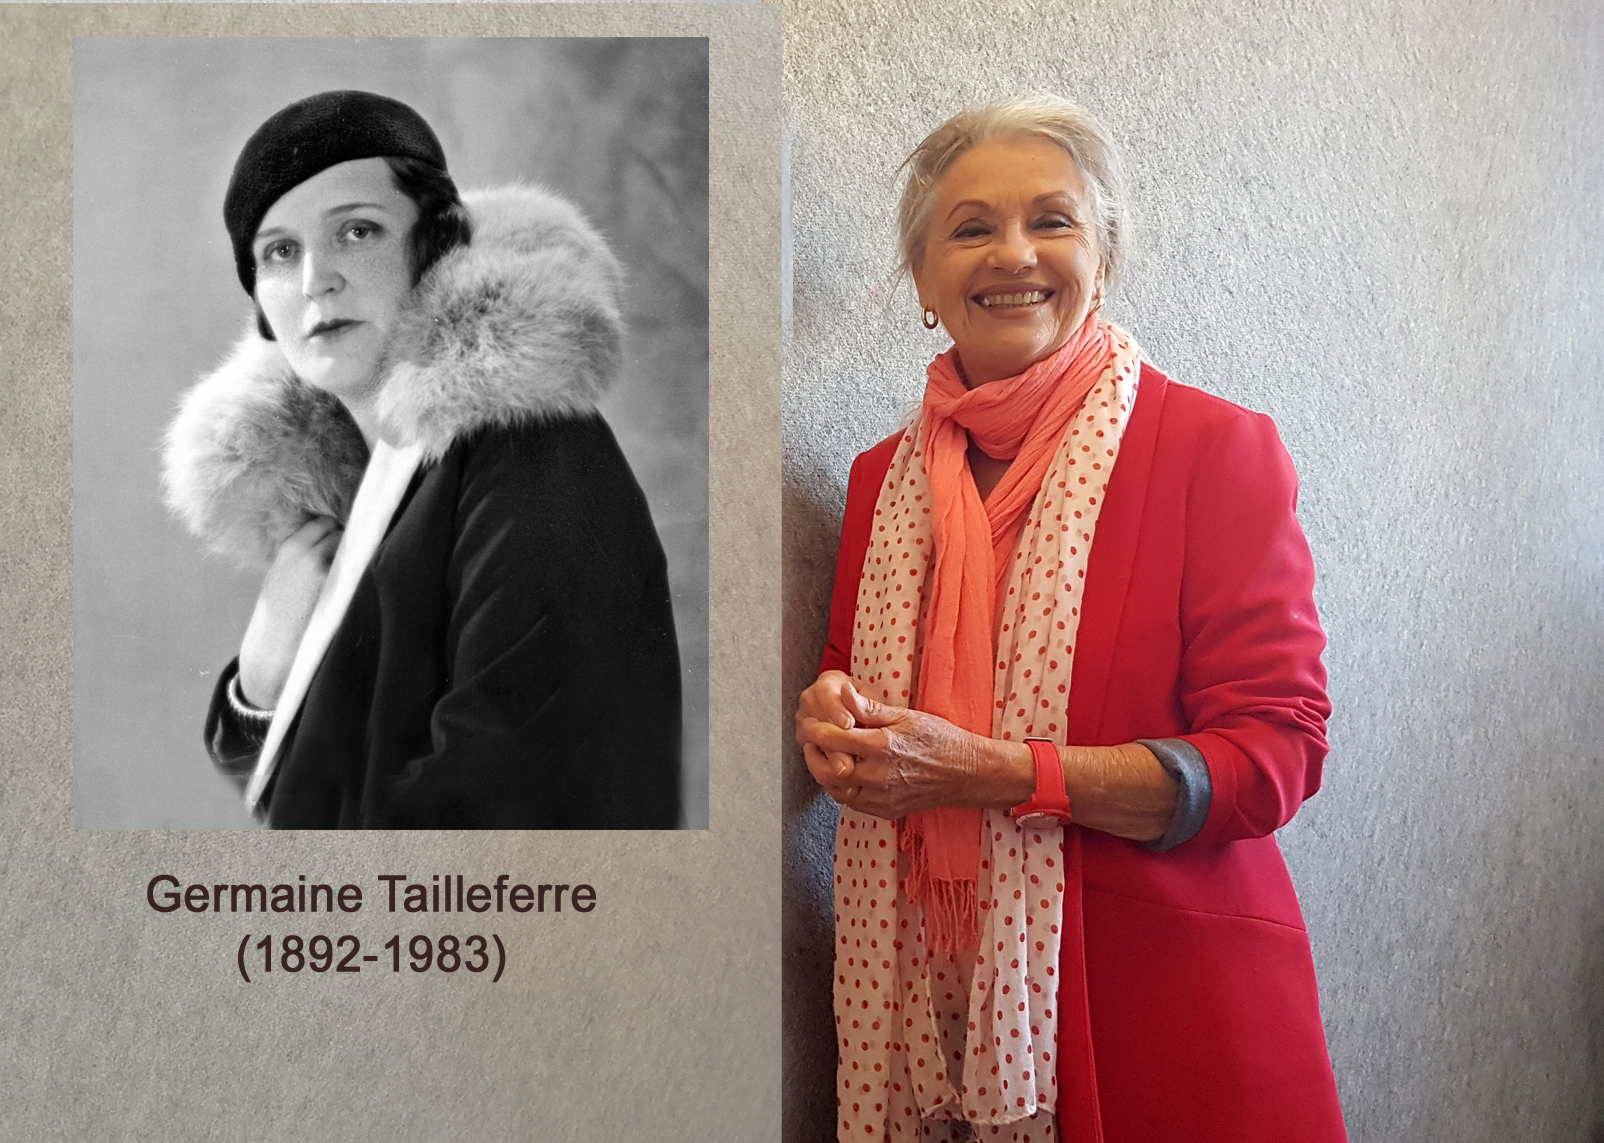 Germaine Tailleferre et Jacqueline Hennegrave